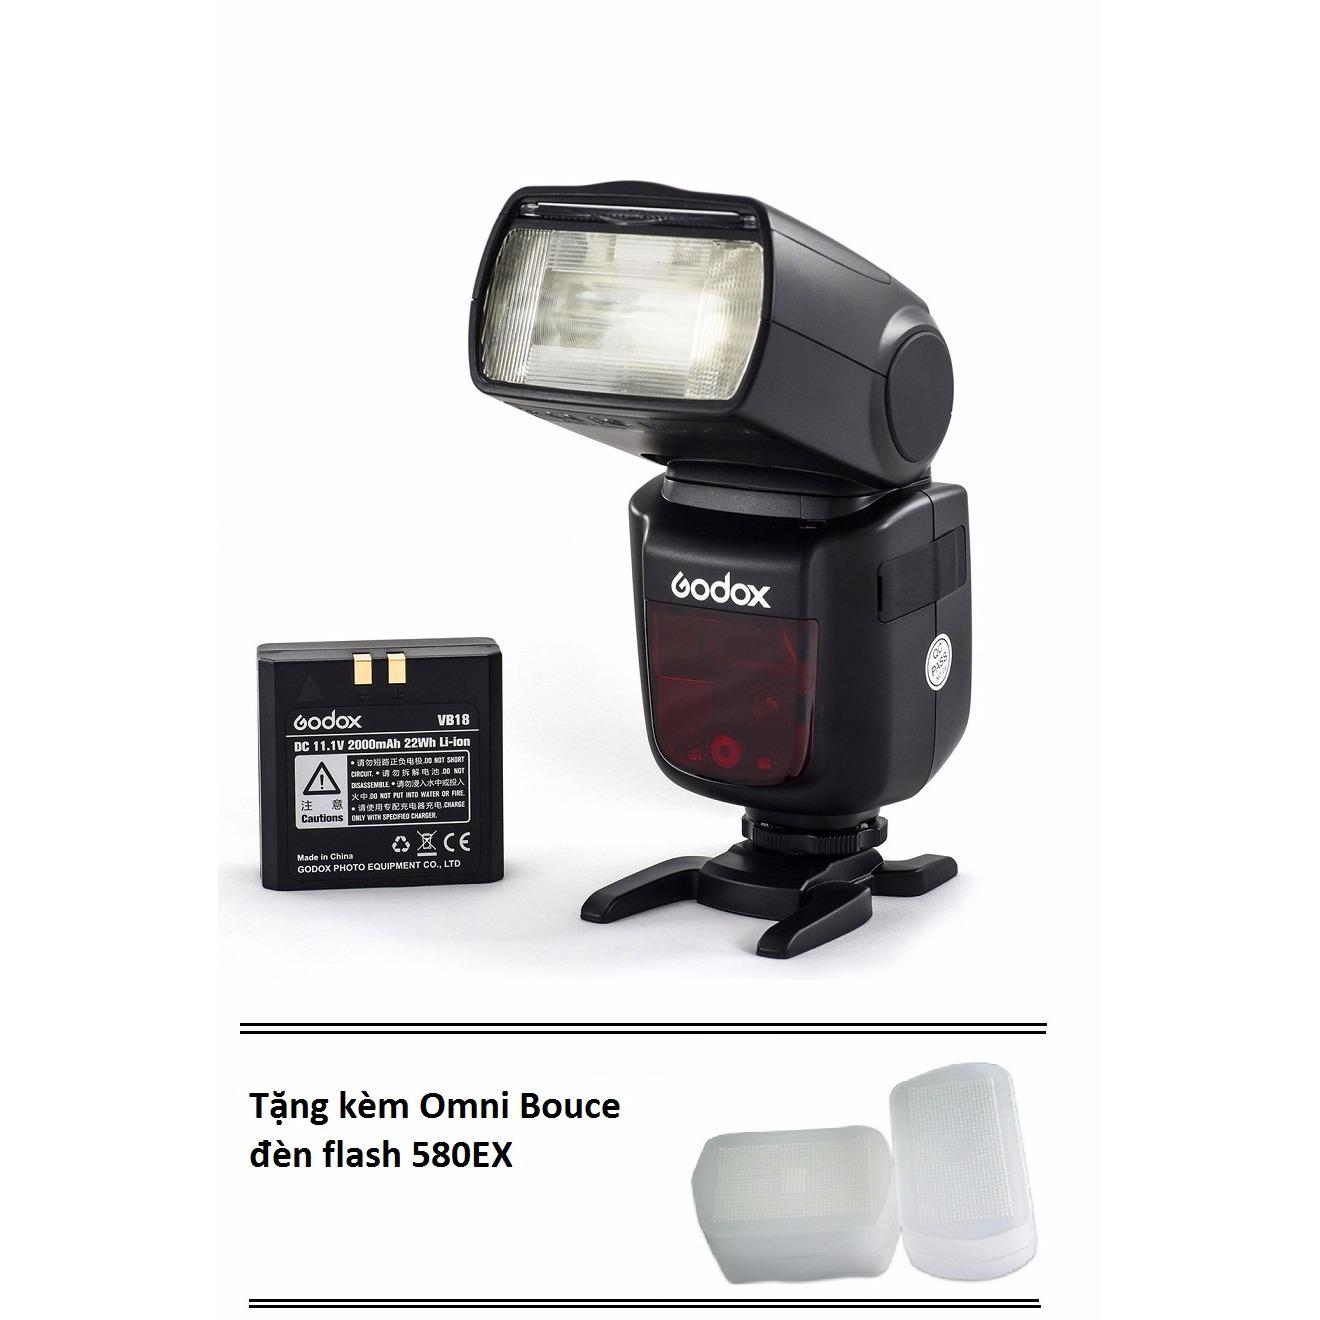 Ôn Tập Flash Godox Li Ion Ving V860Ii For Nikon Kem Pin Sạc Tặng Kem 1 Omni Bounce Flash Đen